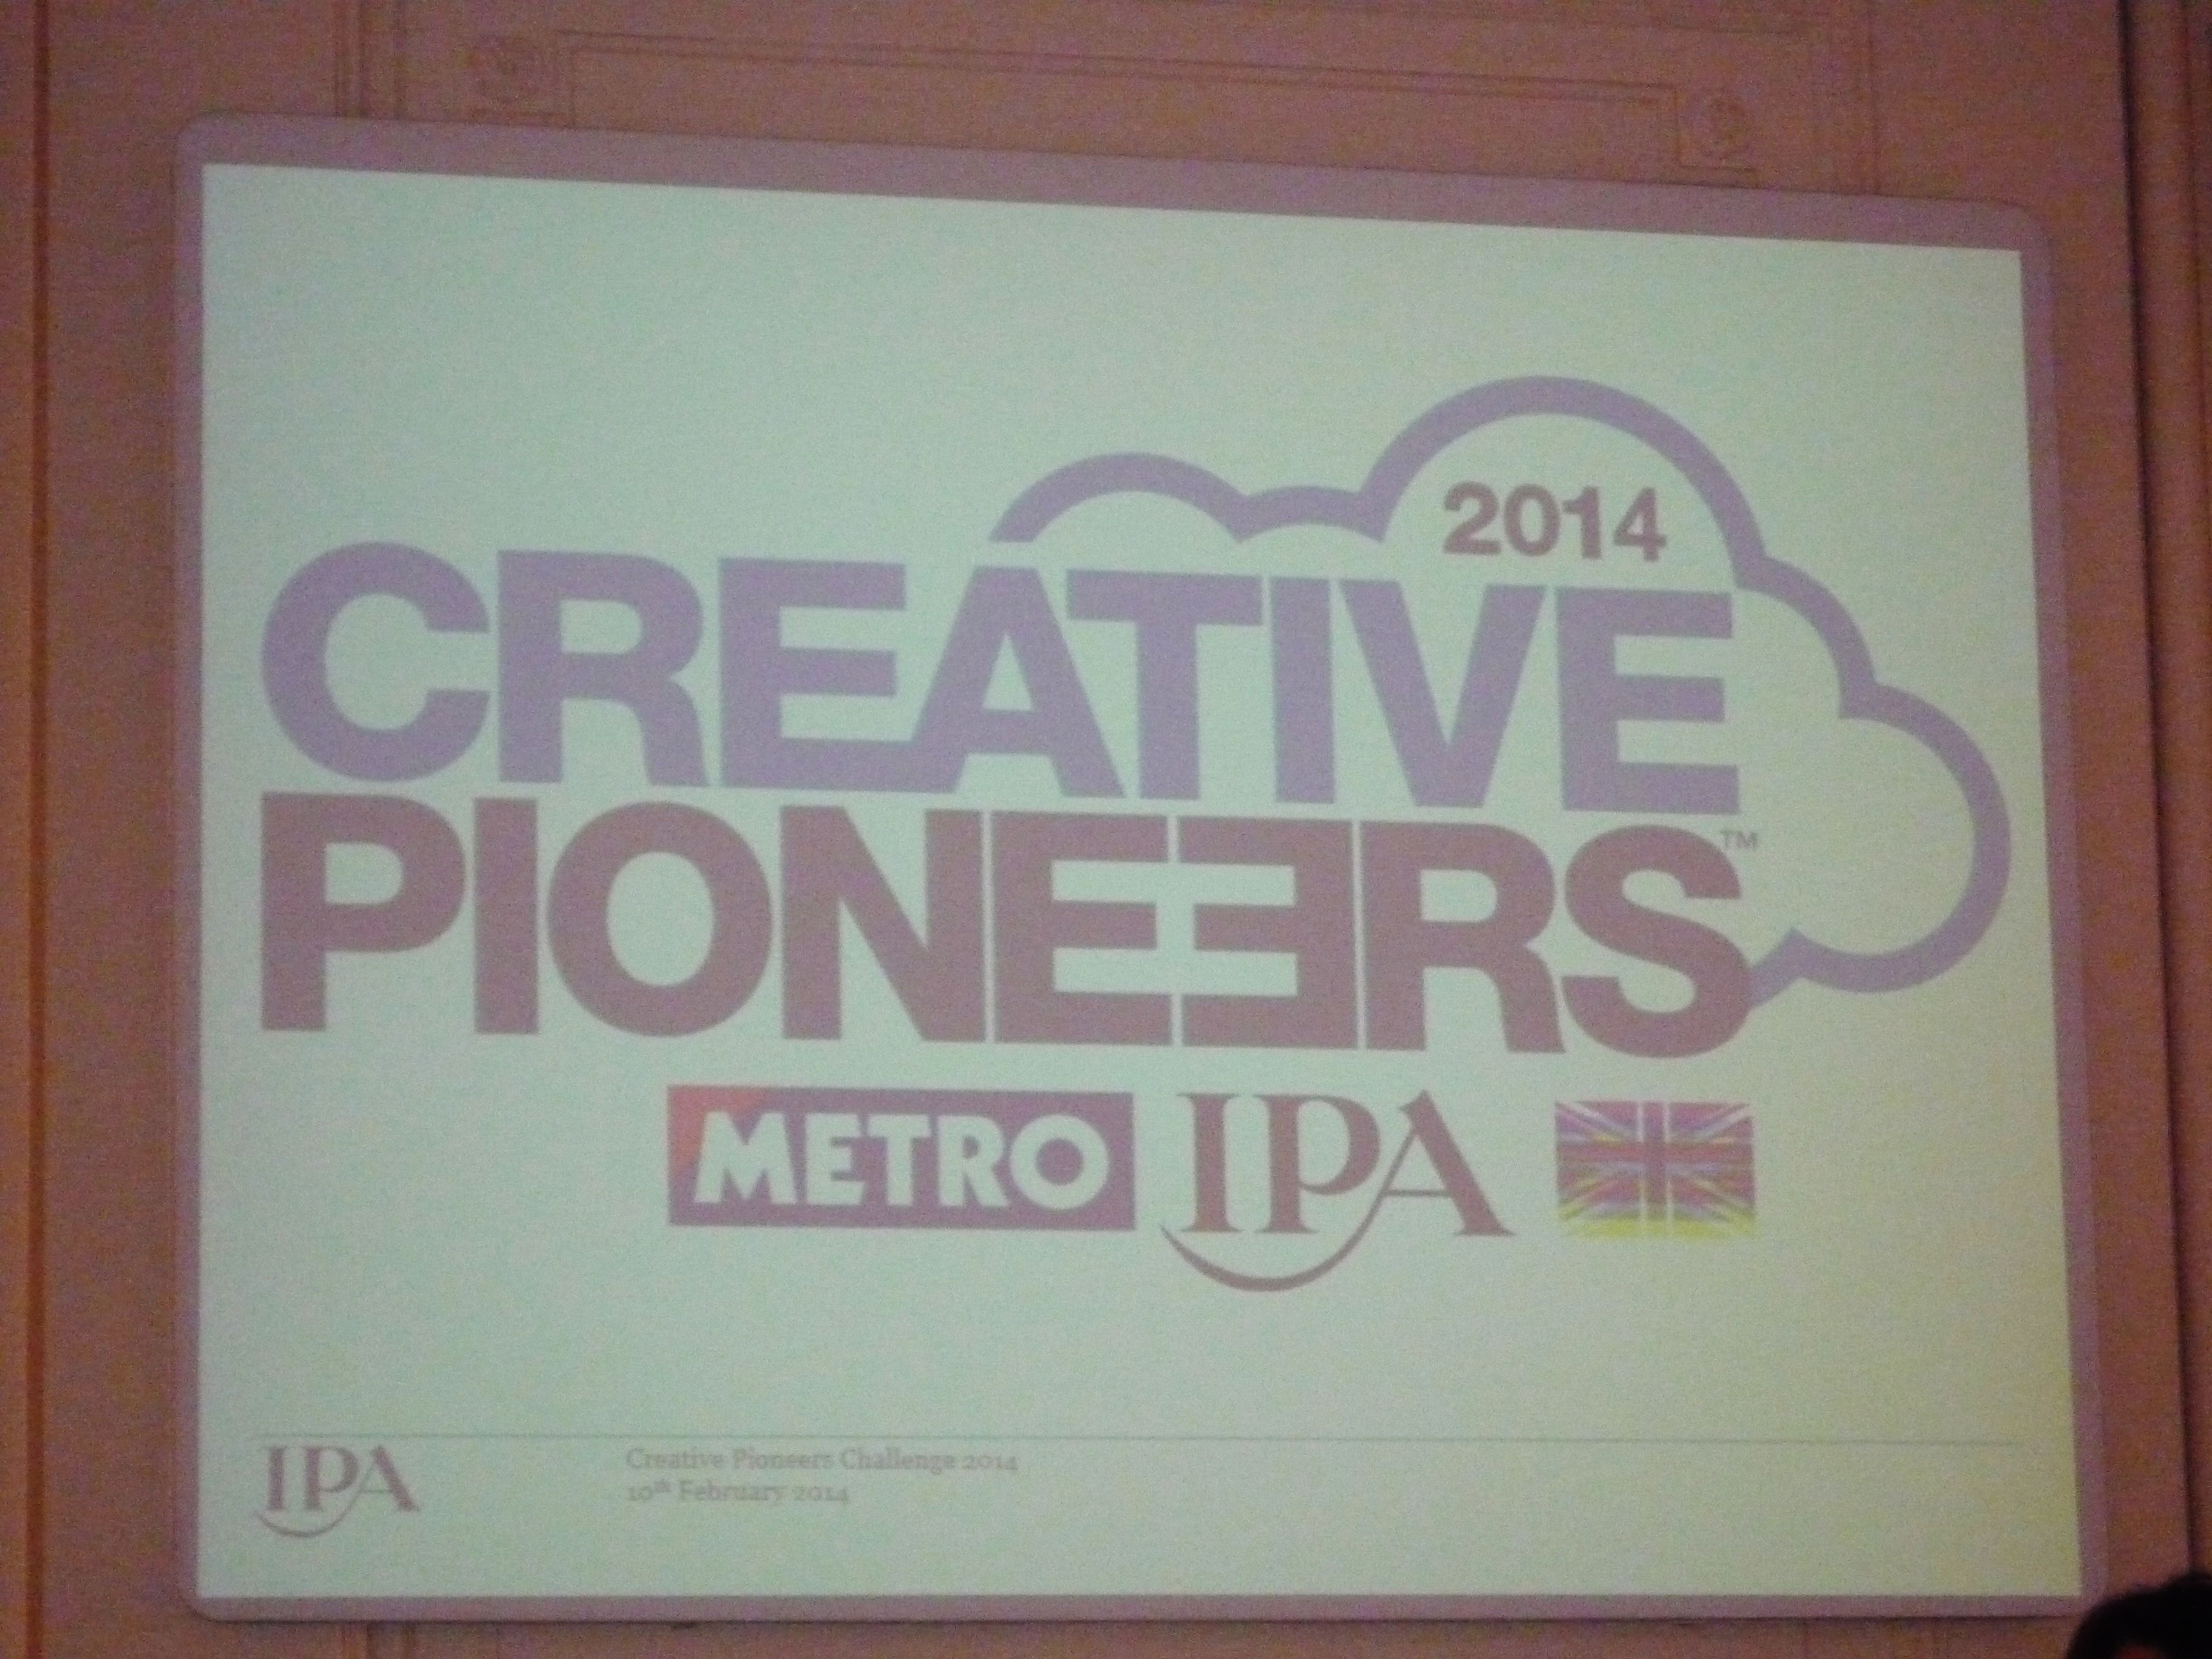 Introduction to the creative pioneers challange ipa